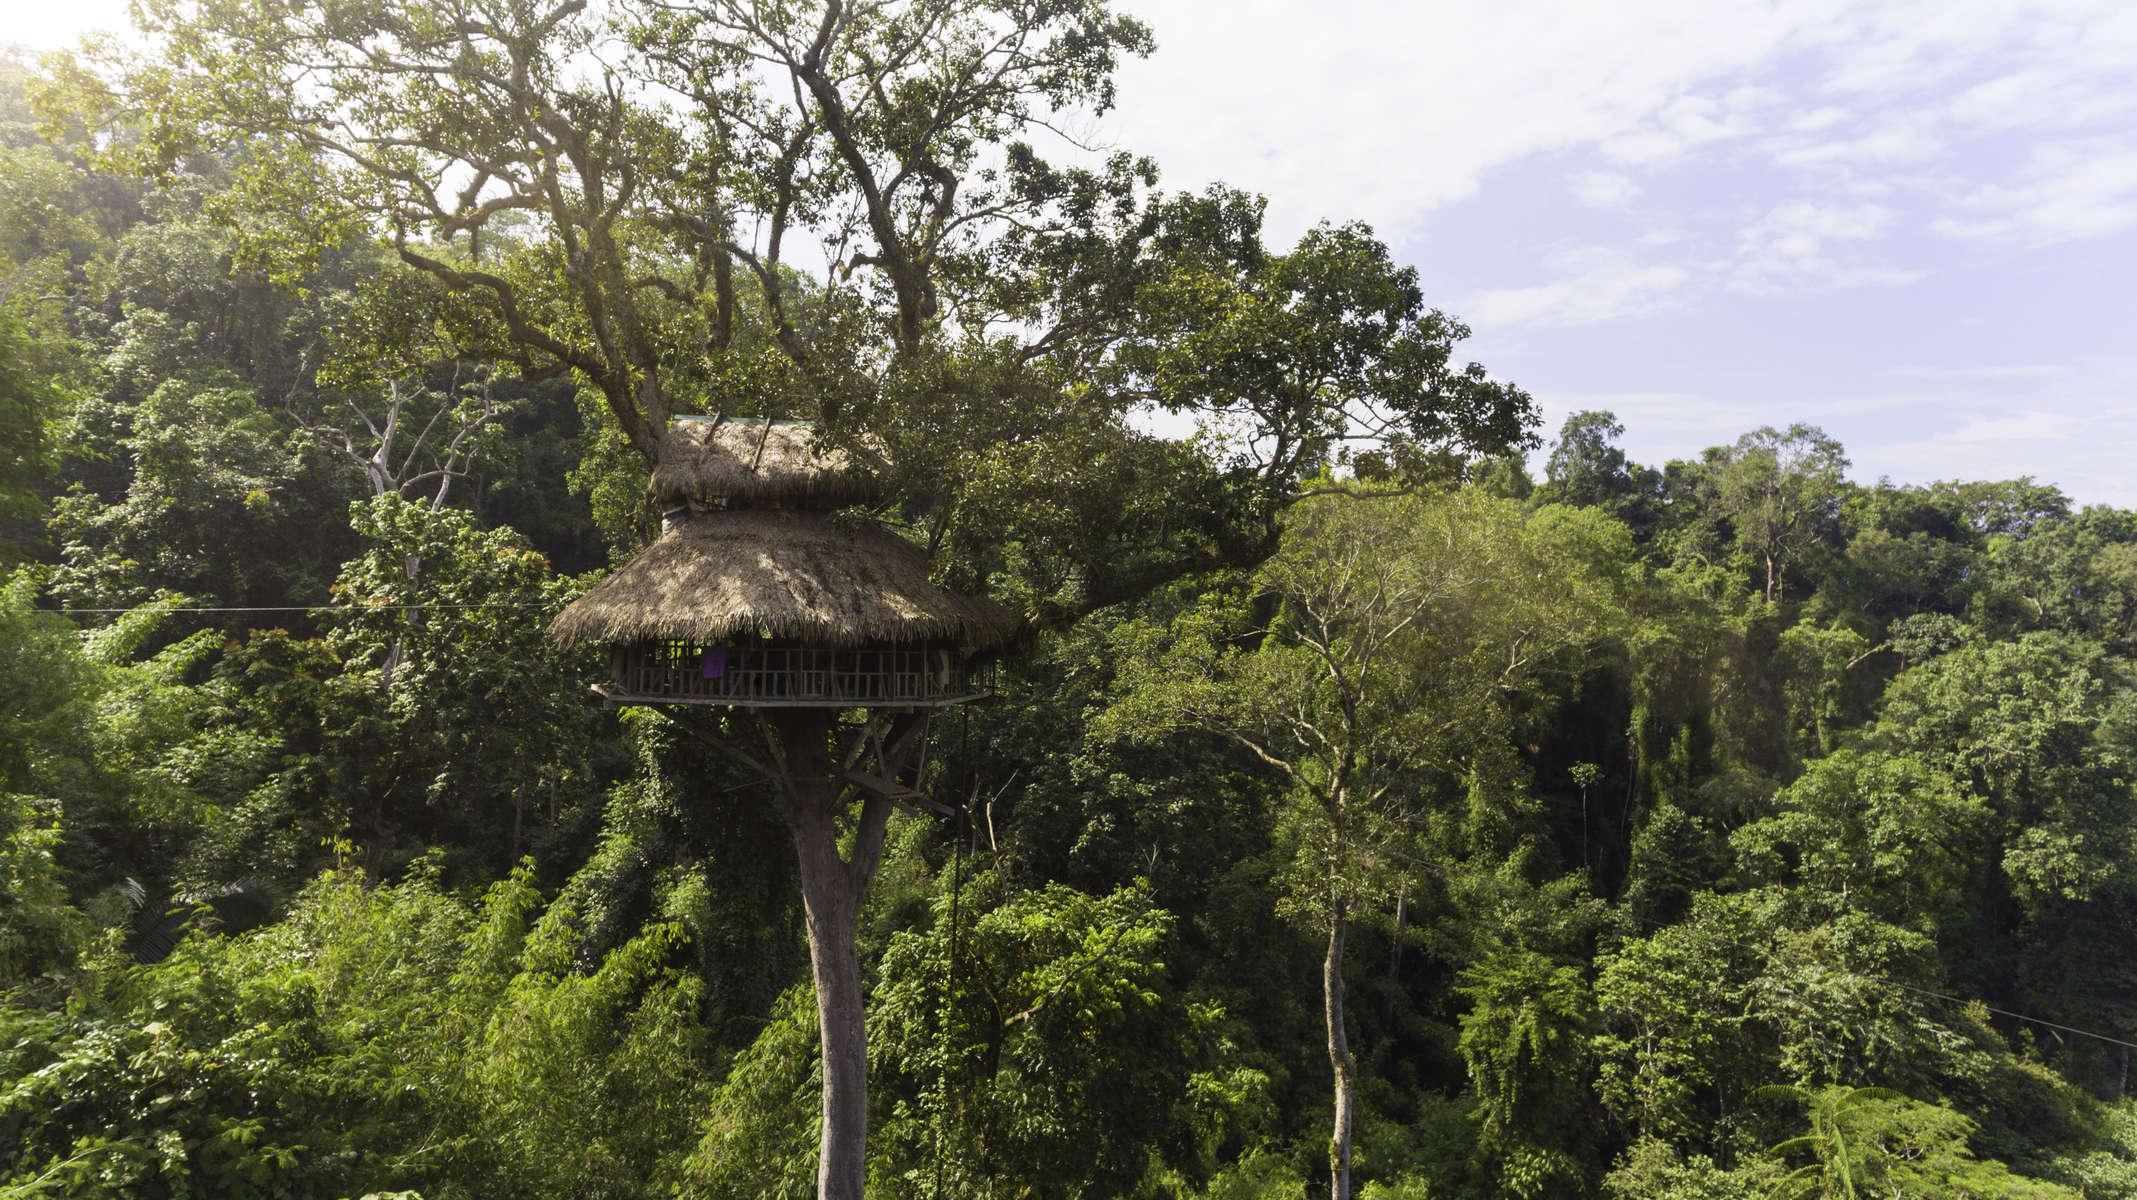 Laos-Bokeo-Gibbon-Experience-Tree-House-GIZ-Photo-by-Cyril-Eberle-DJI_0457